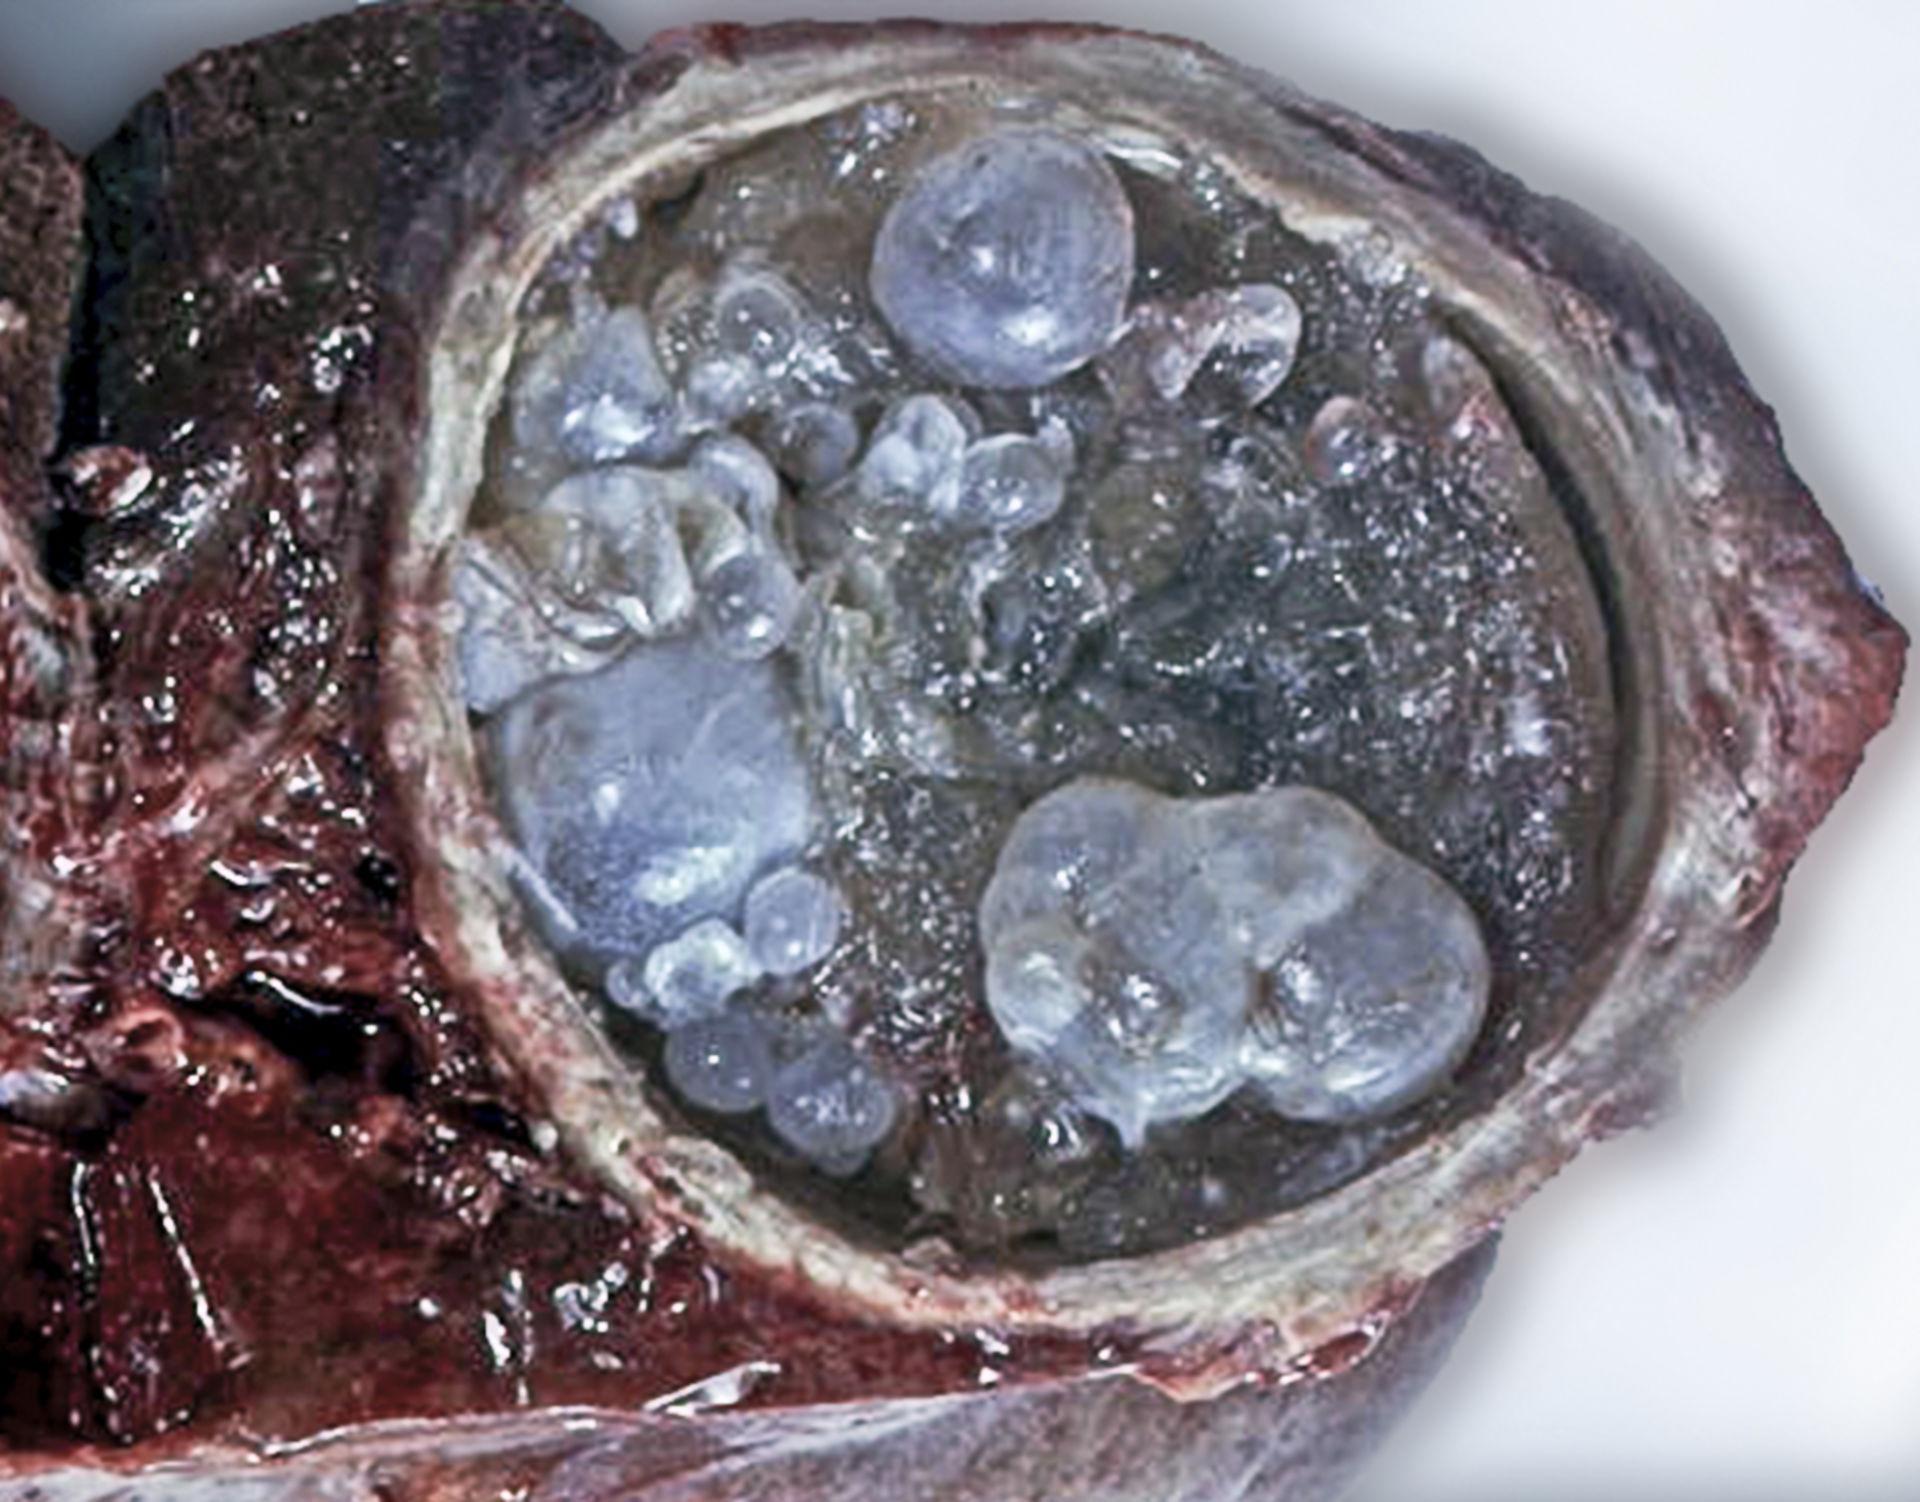 Echinokokkenzyste - Makroskopie